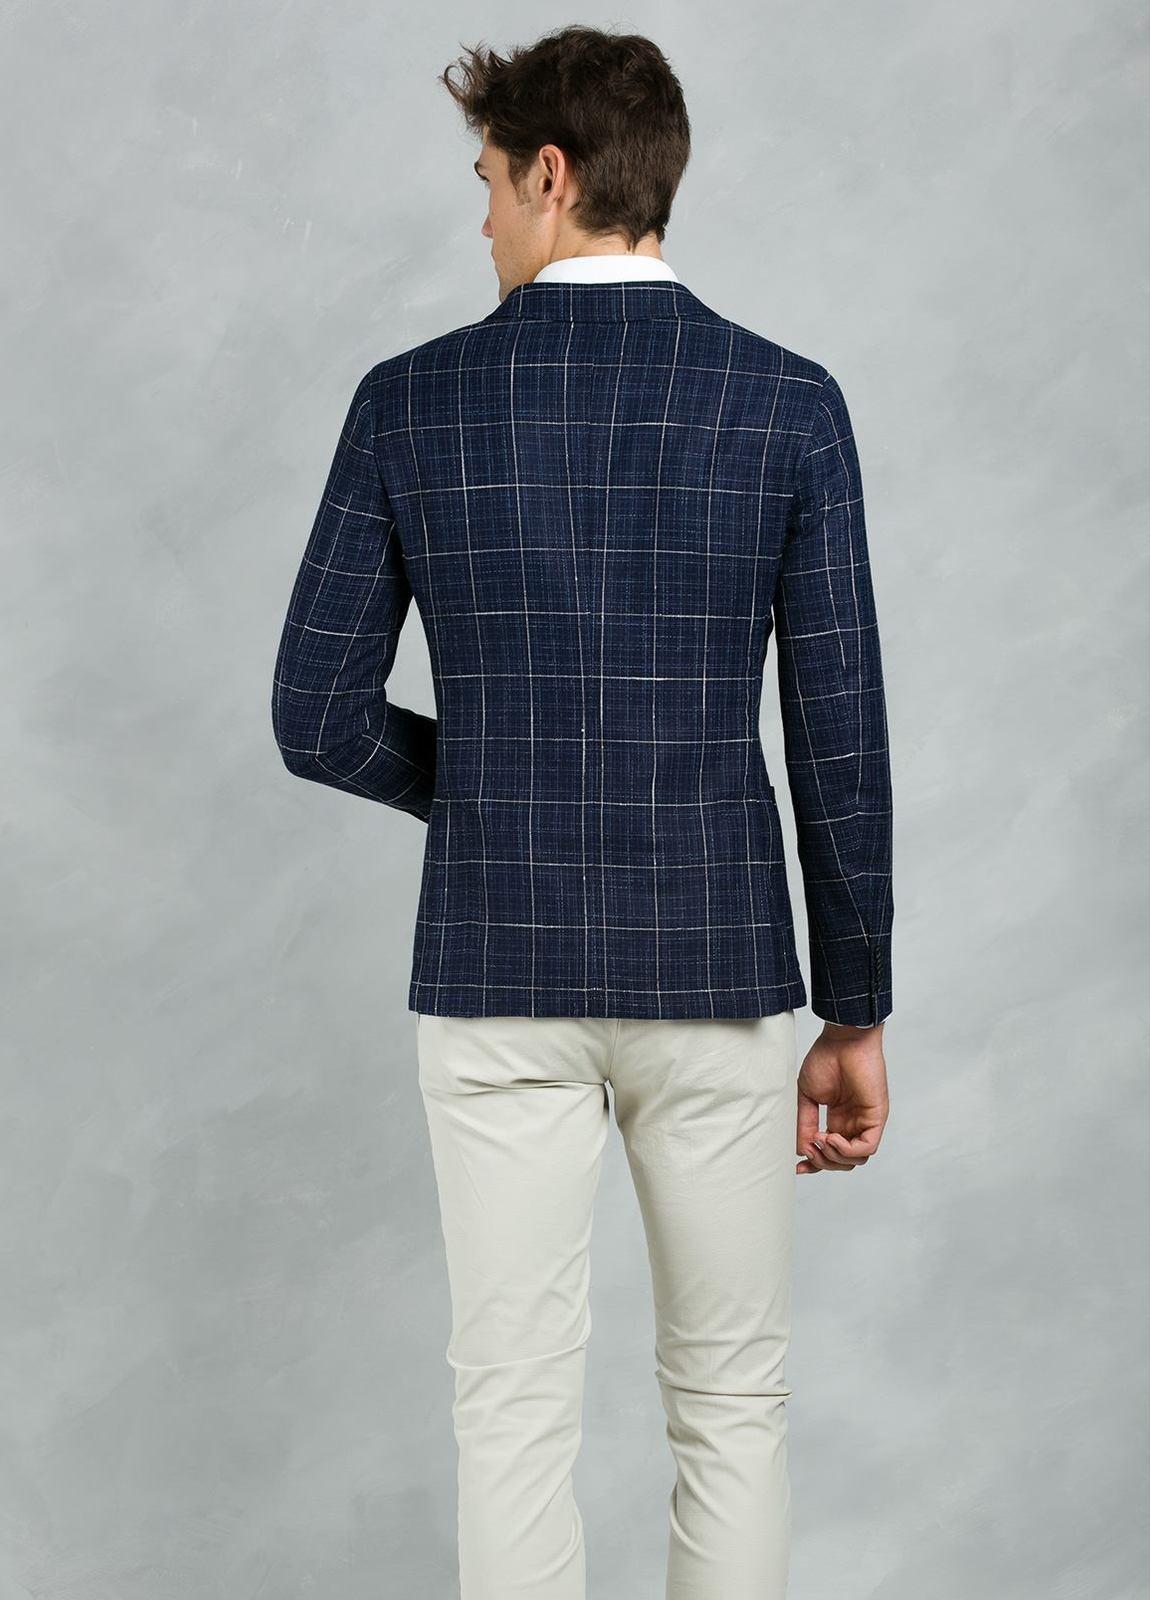 Americana SOFT JACKET Slim Fit con diseño cuadro ventana color azul, 90% Viscosa 5% Lino 5% Algodón. - Ítem4